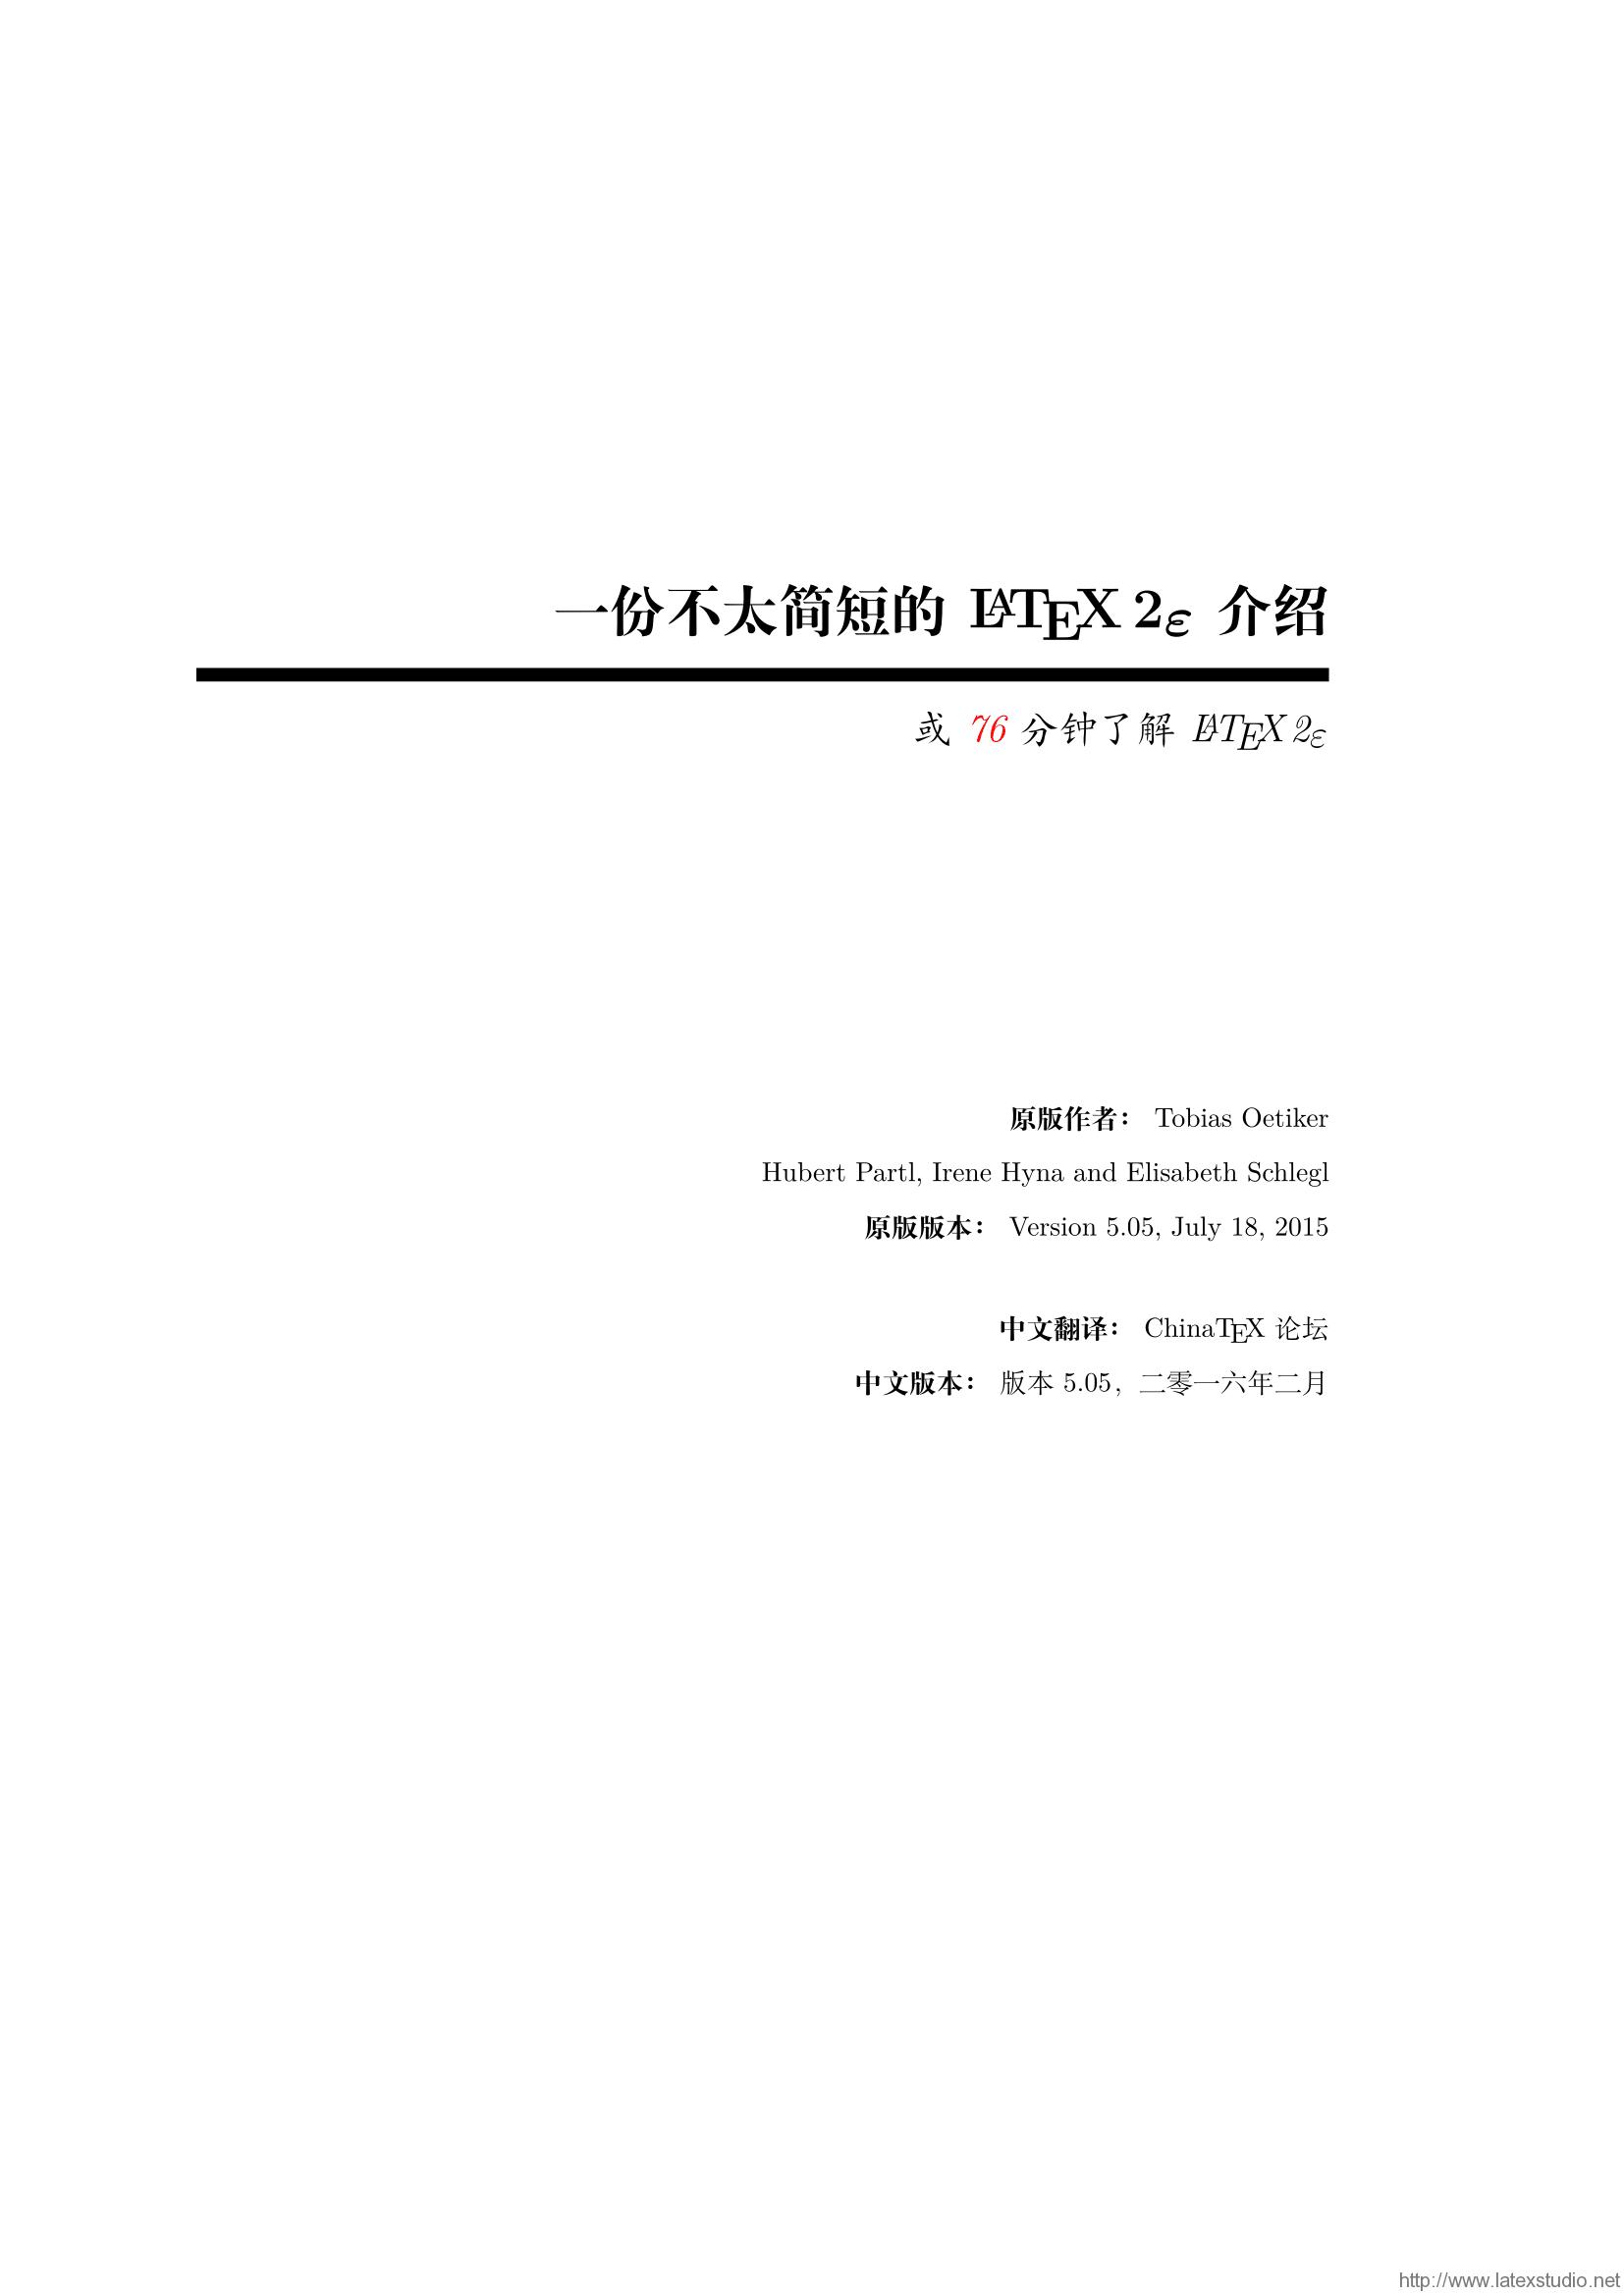 lshort-zh-cn-01